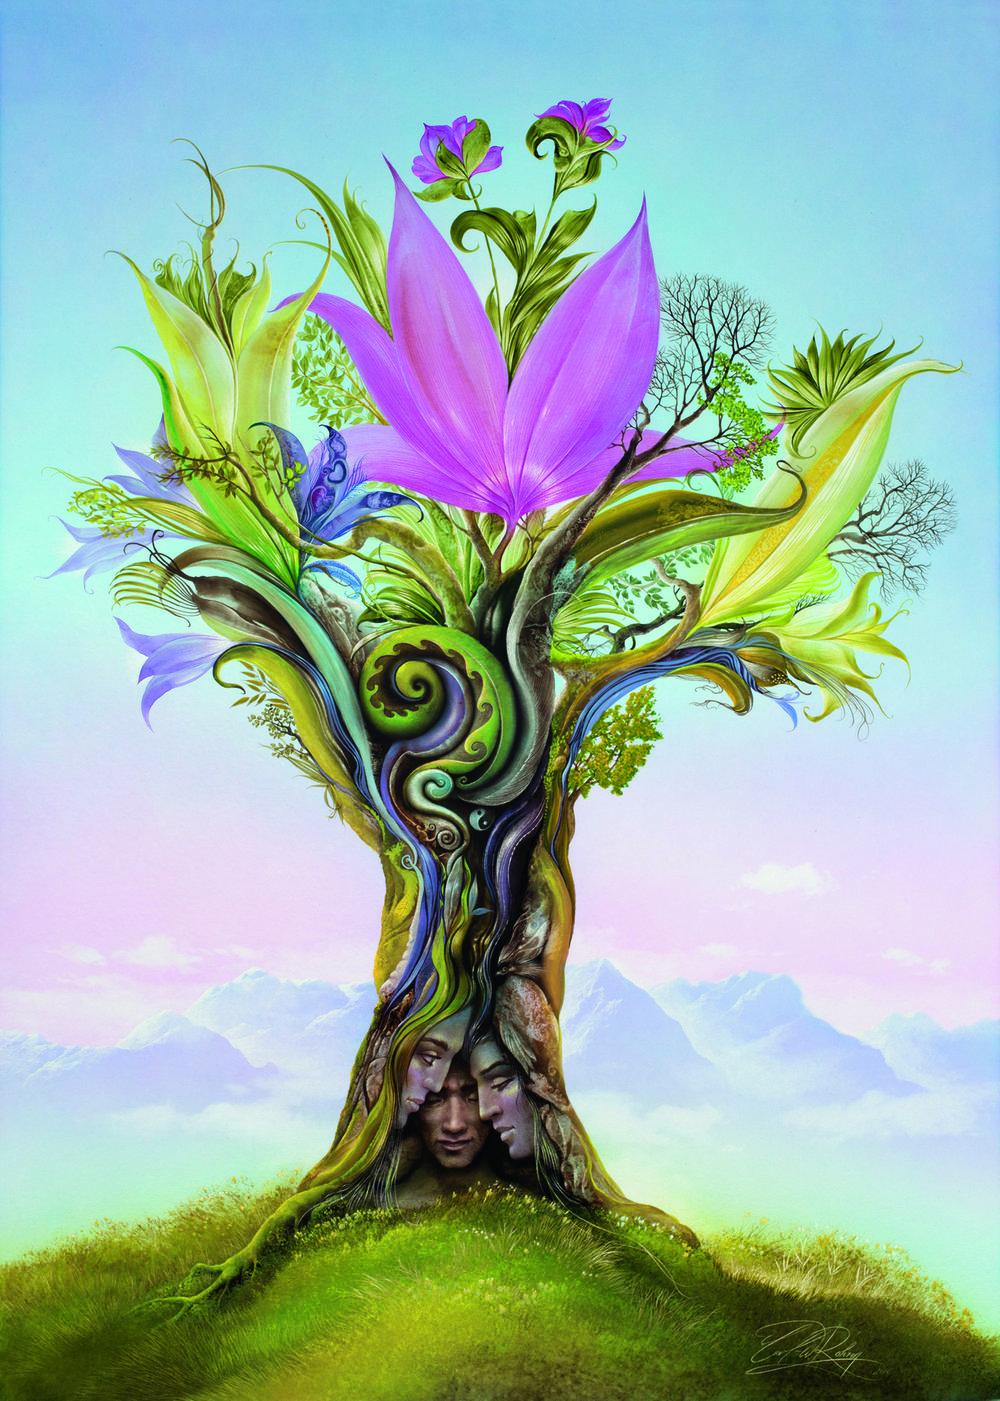 """Baum der Entfaltung"" 102x73cm CHF10,500"